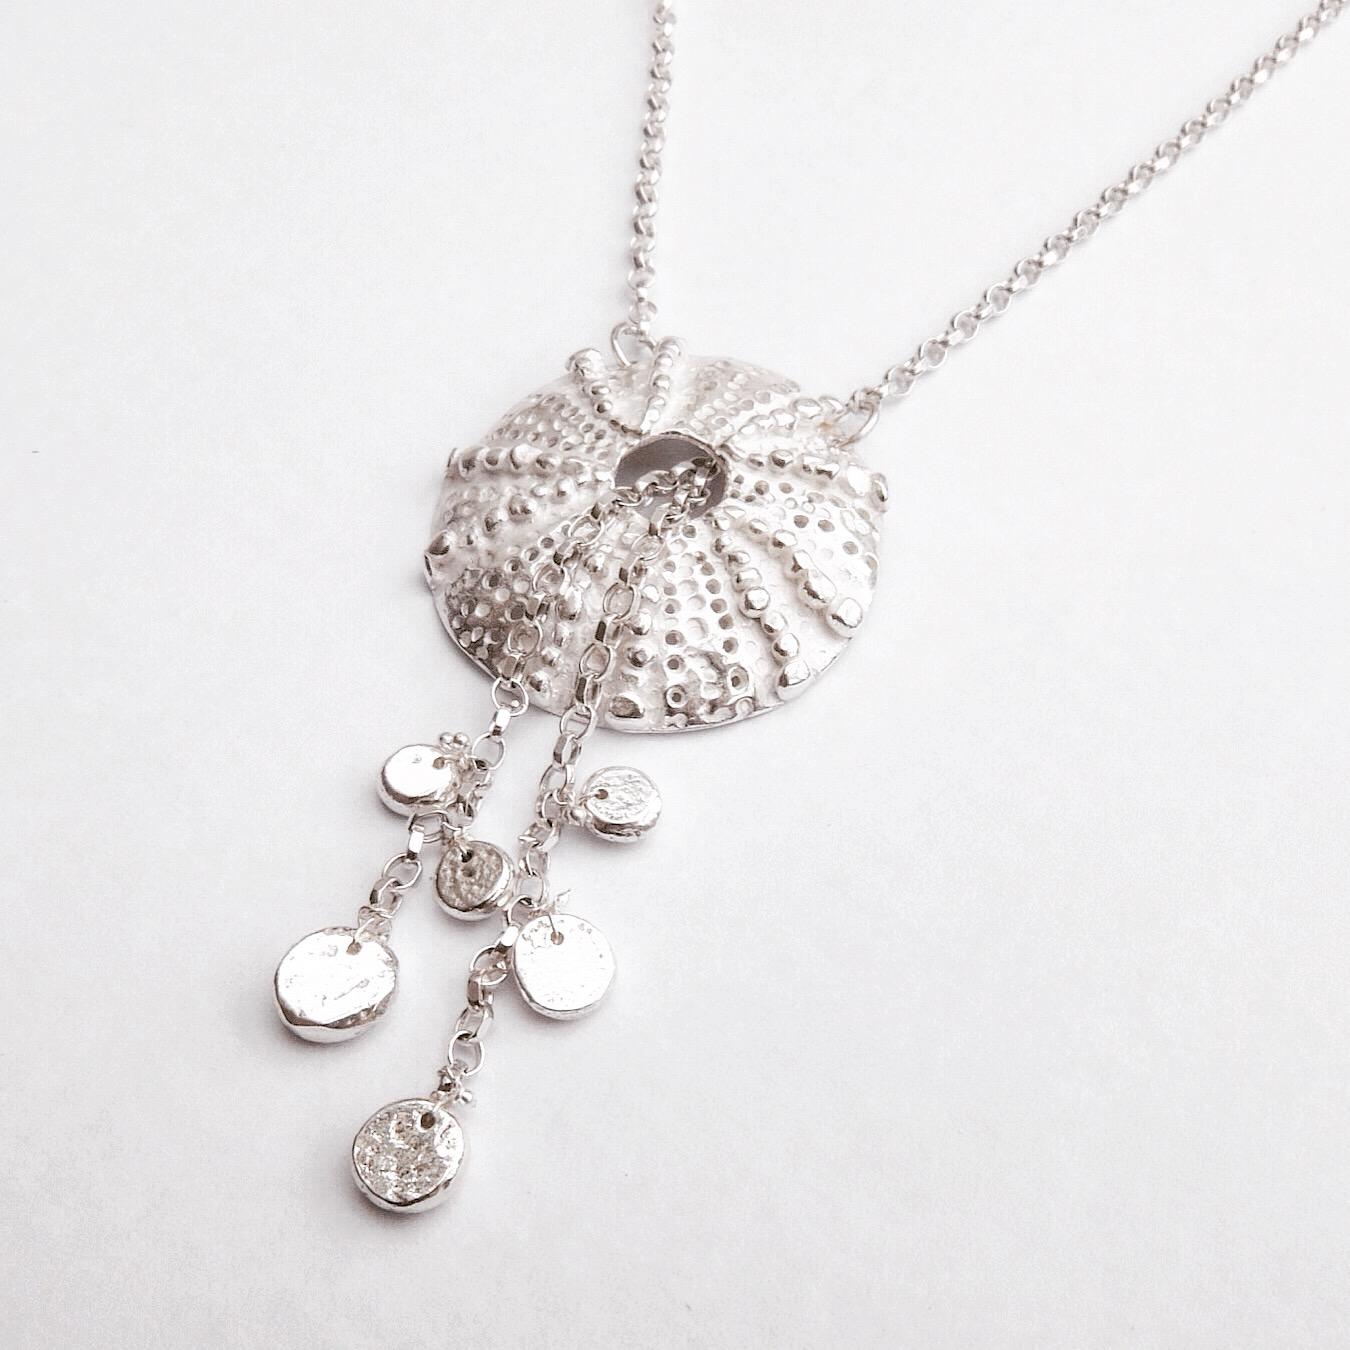 Sterling Silver Sea Urchin Pendant with Detachable Pebble Drops